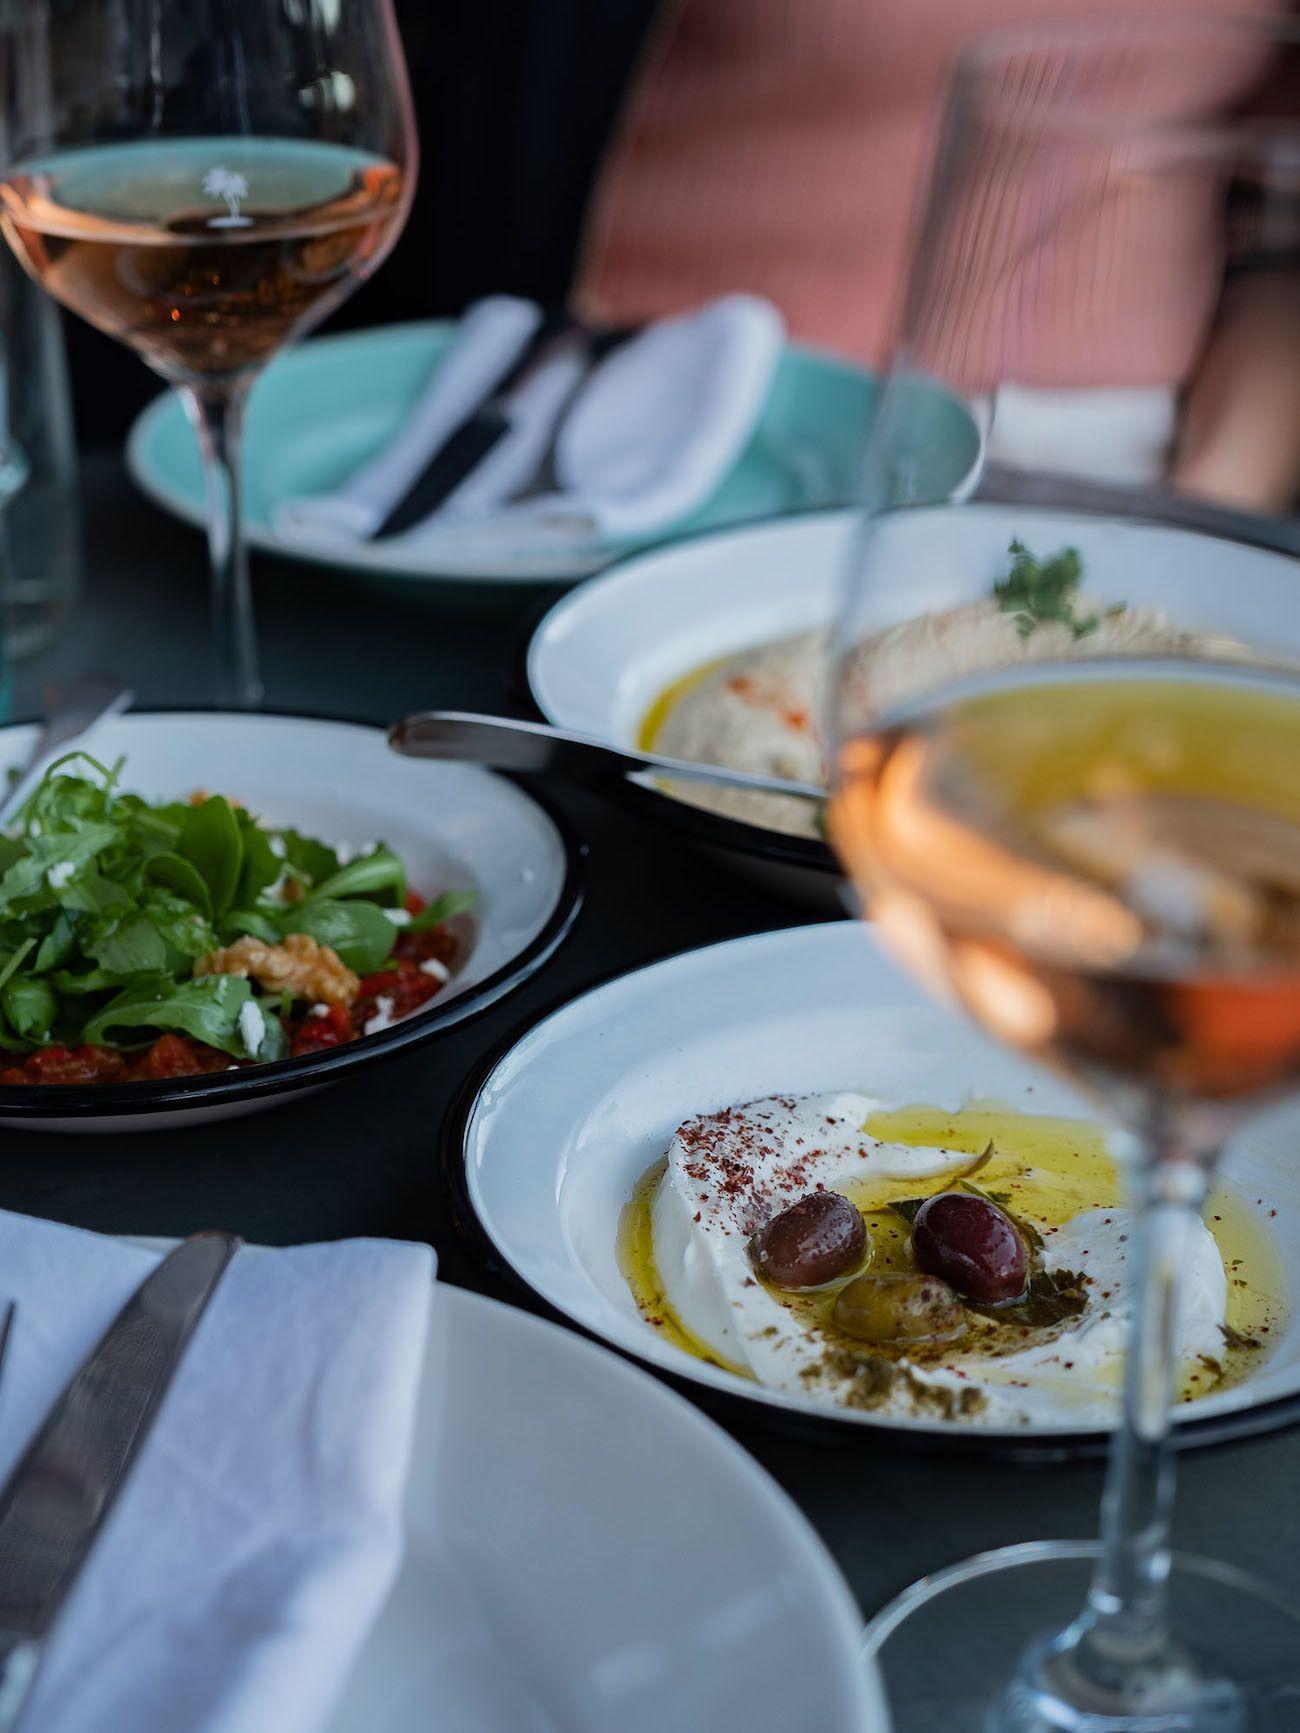 Foodblog About Fuel, Bikini Island & Mountain Hotels, Mezze, Labneh, Sakuska, Hummus